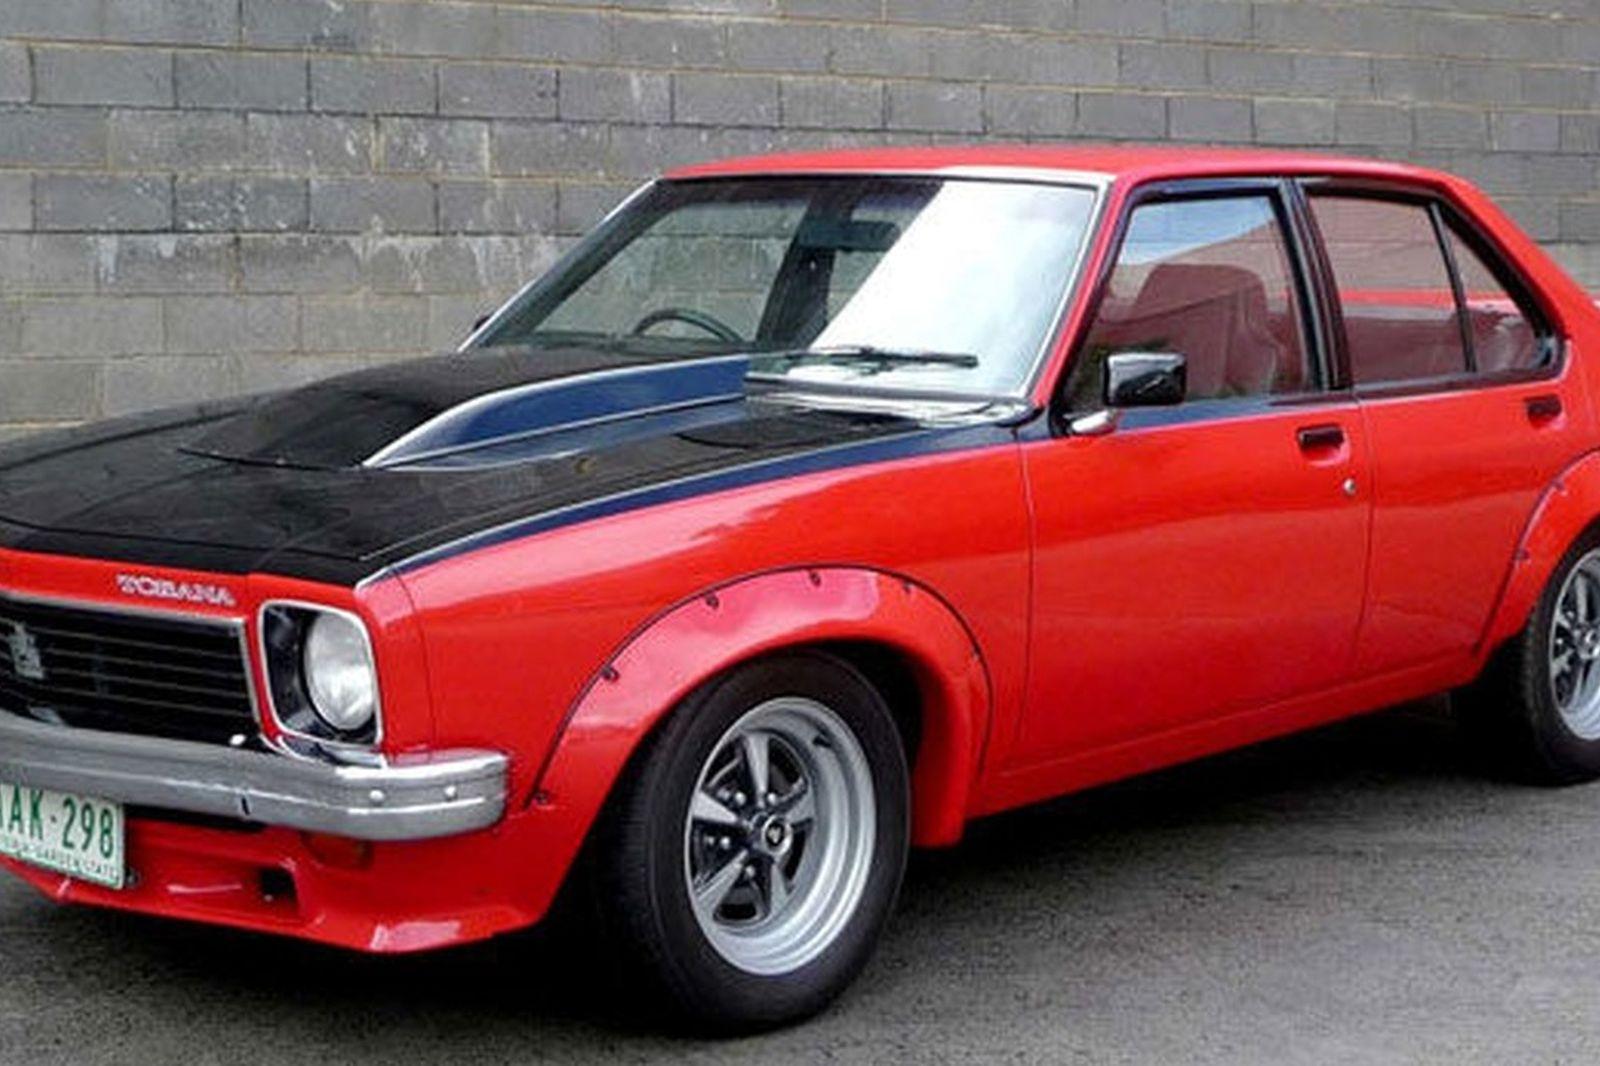 Holden Torana Slr 5000 For Sale 1974 Holden Torana Sl